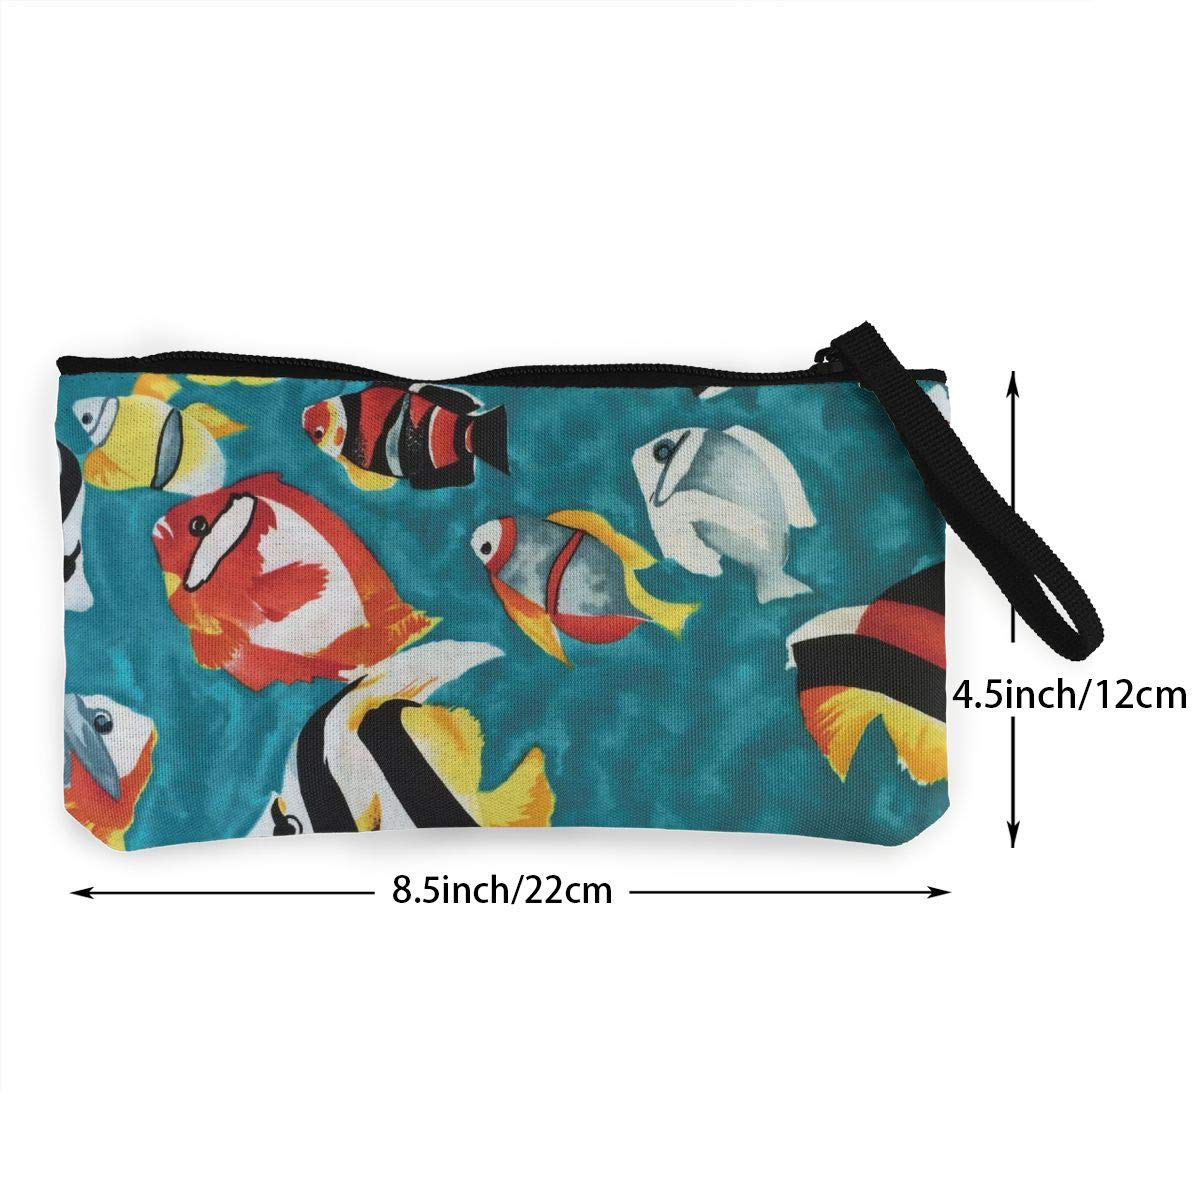 Cellphone Bag With Handle Make Up Bag TR7FD15DE Colorful Tropical Fish Zipper Canvas Coin Purse Wallet